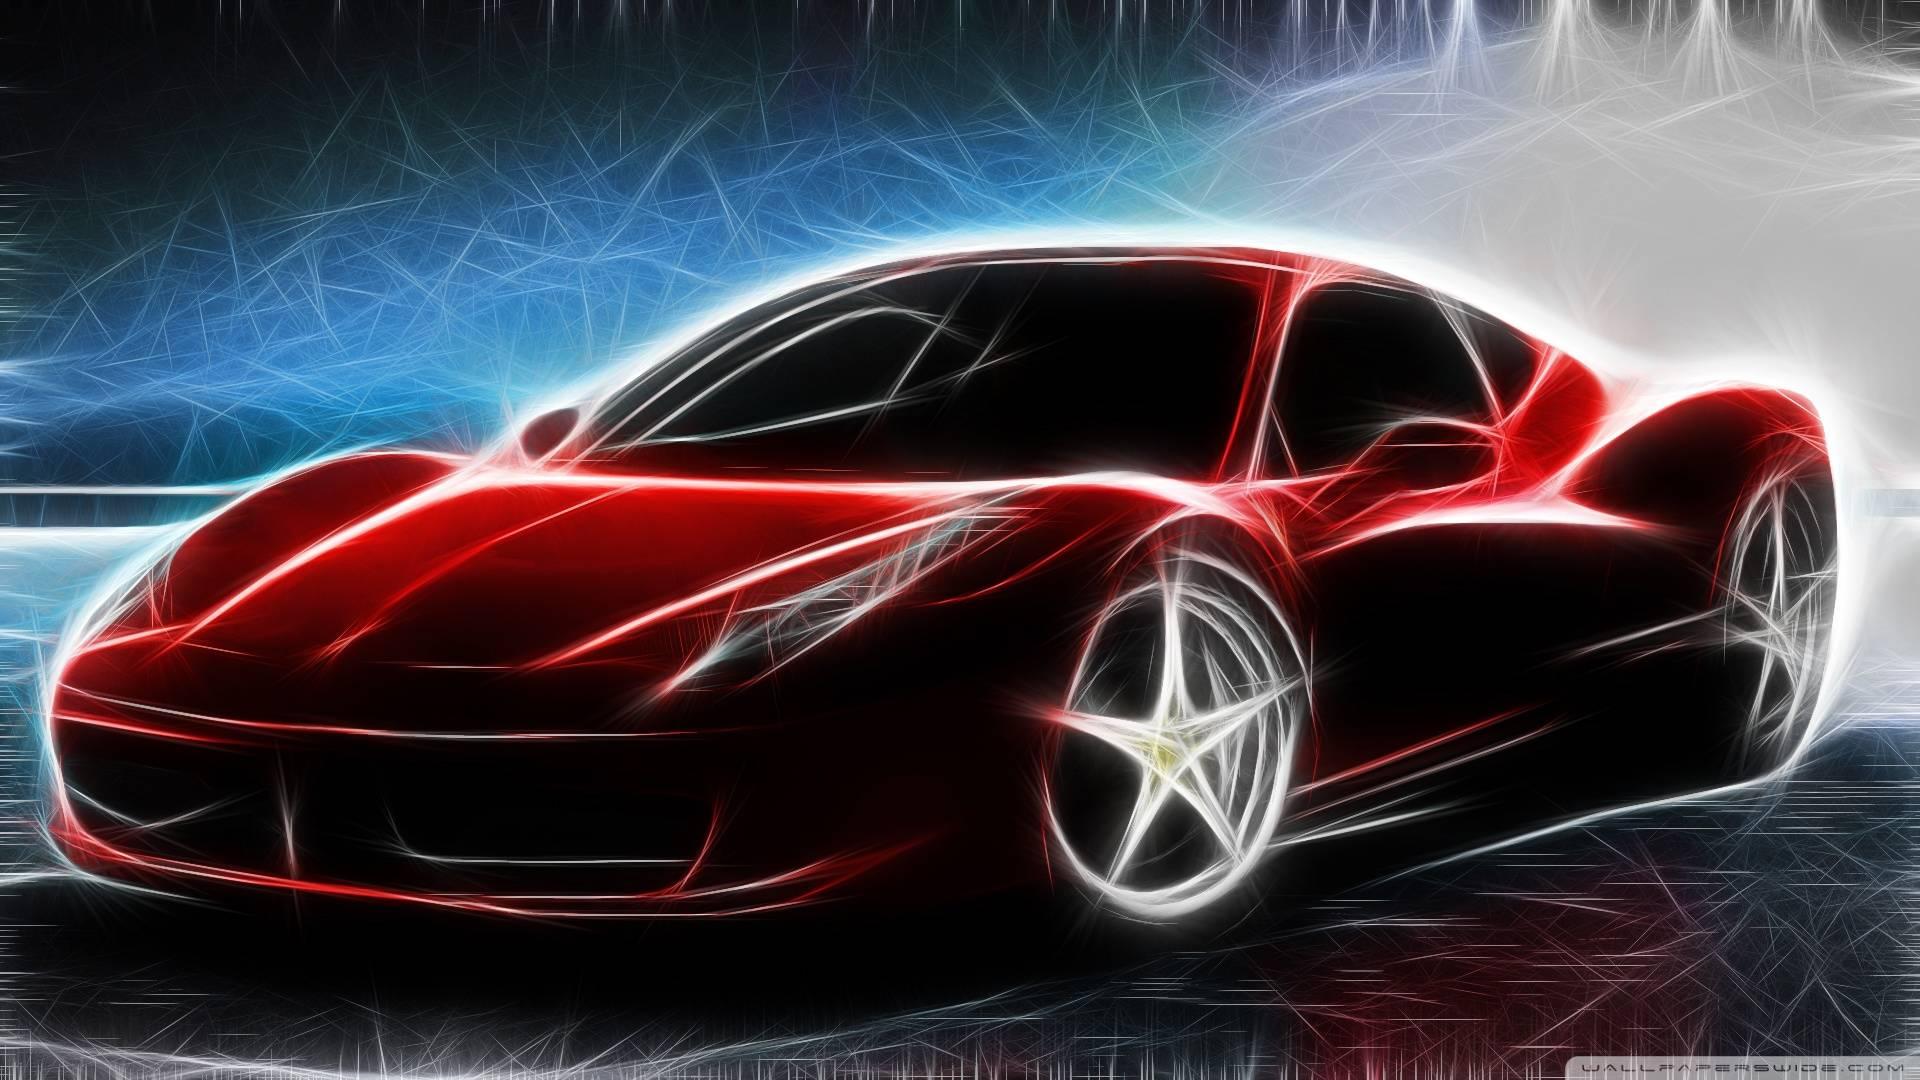 Ferrari 458 Italia Wallpaper Ferrari 458 Italia Wallpaper 1920x1080